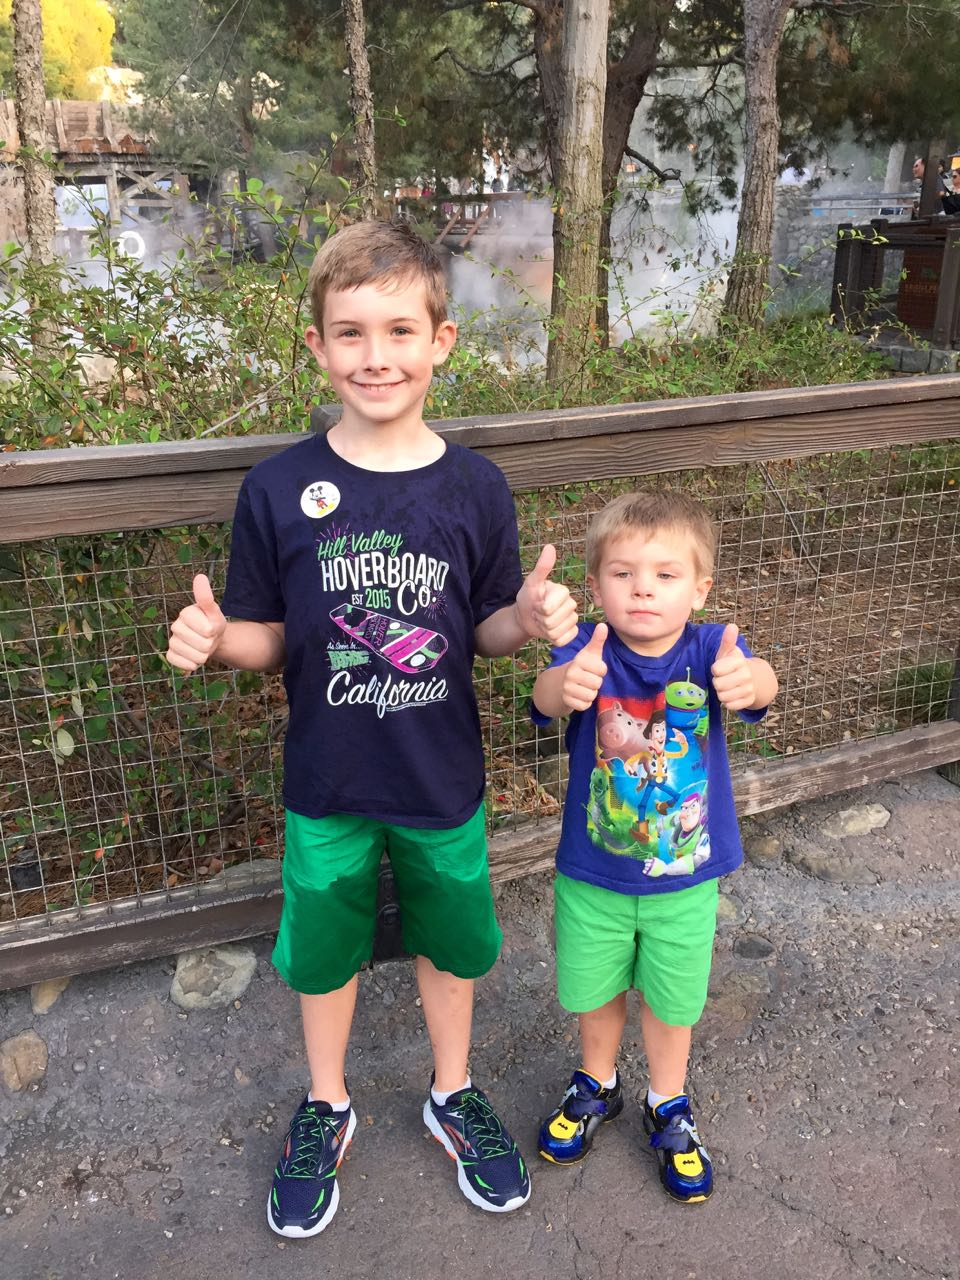 Grizzly River Rapids Disney's California Adventure